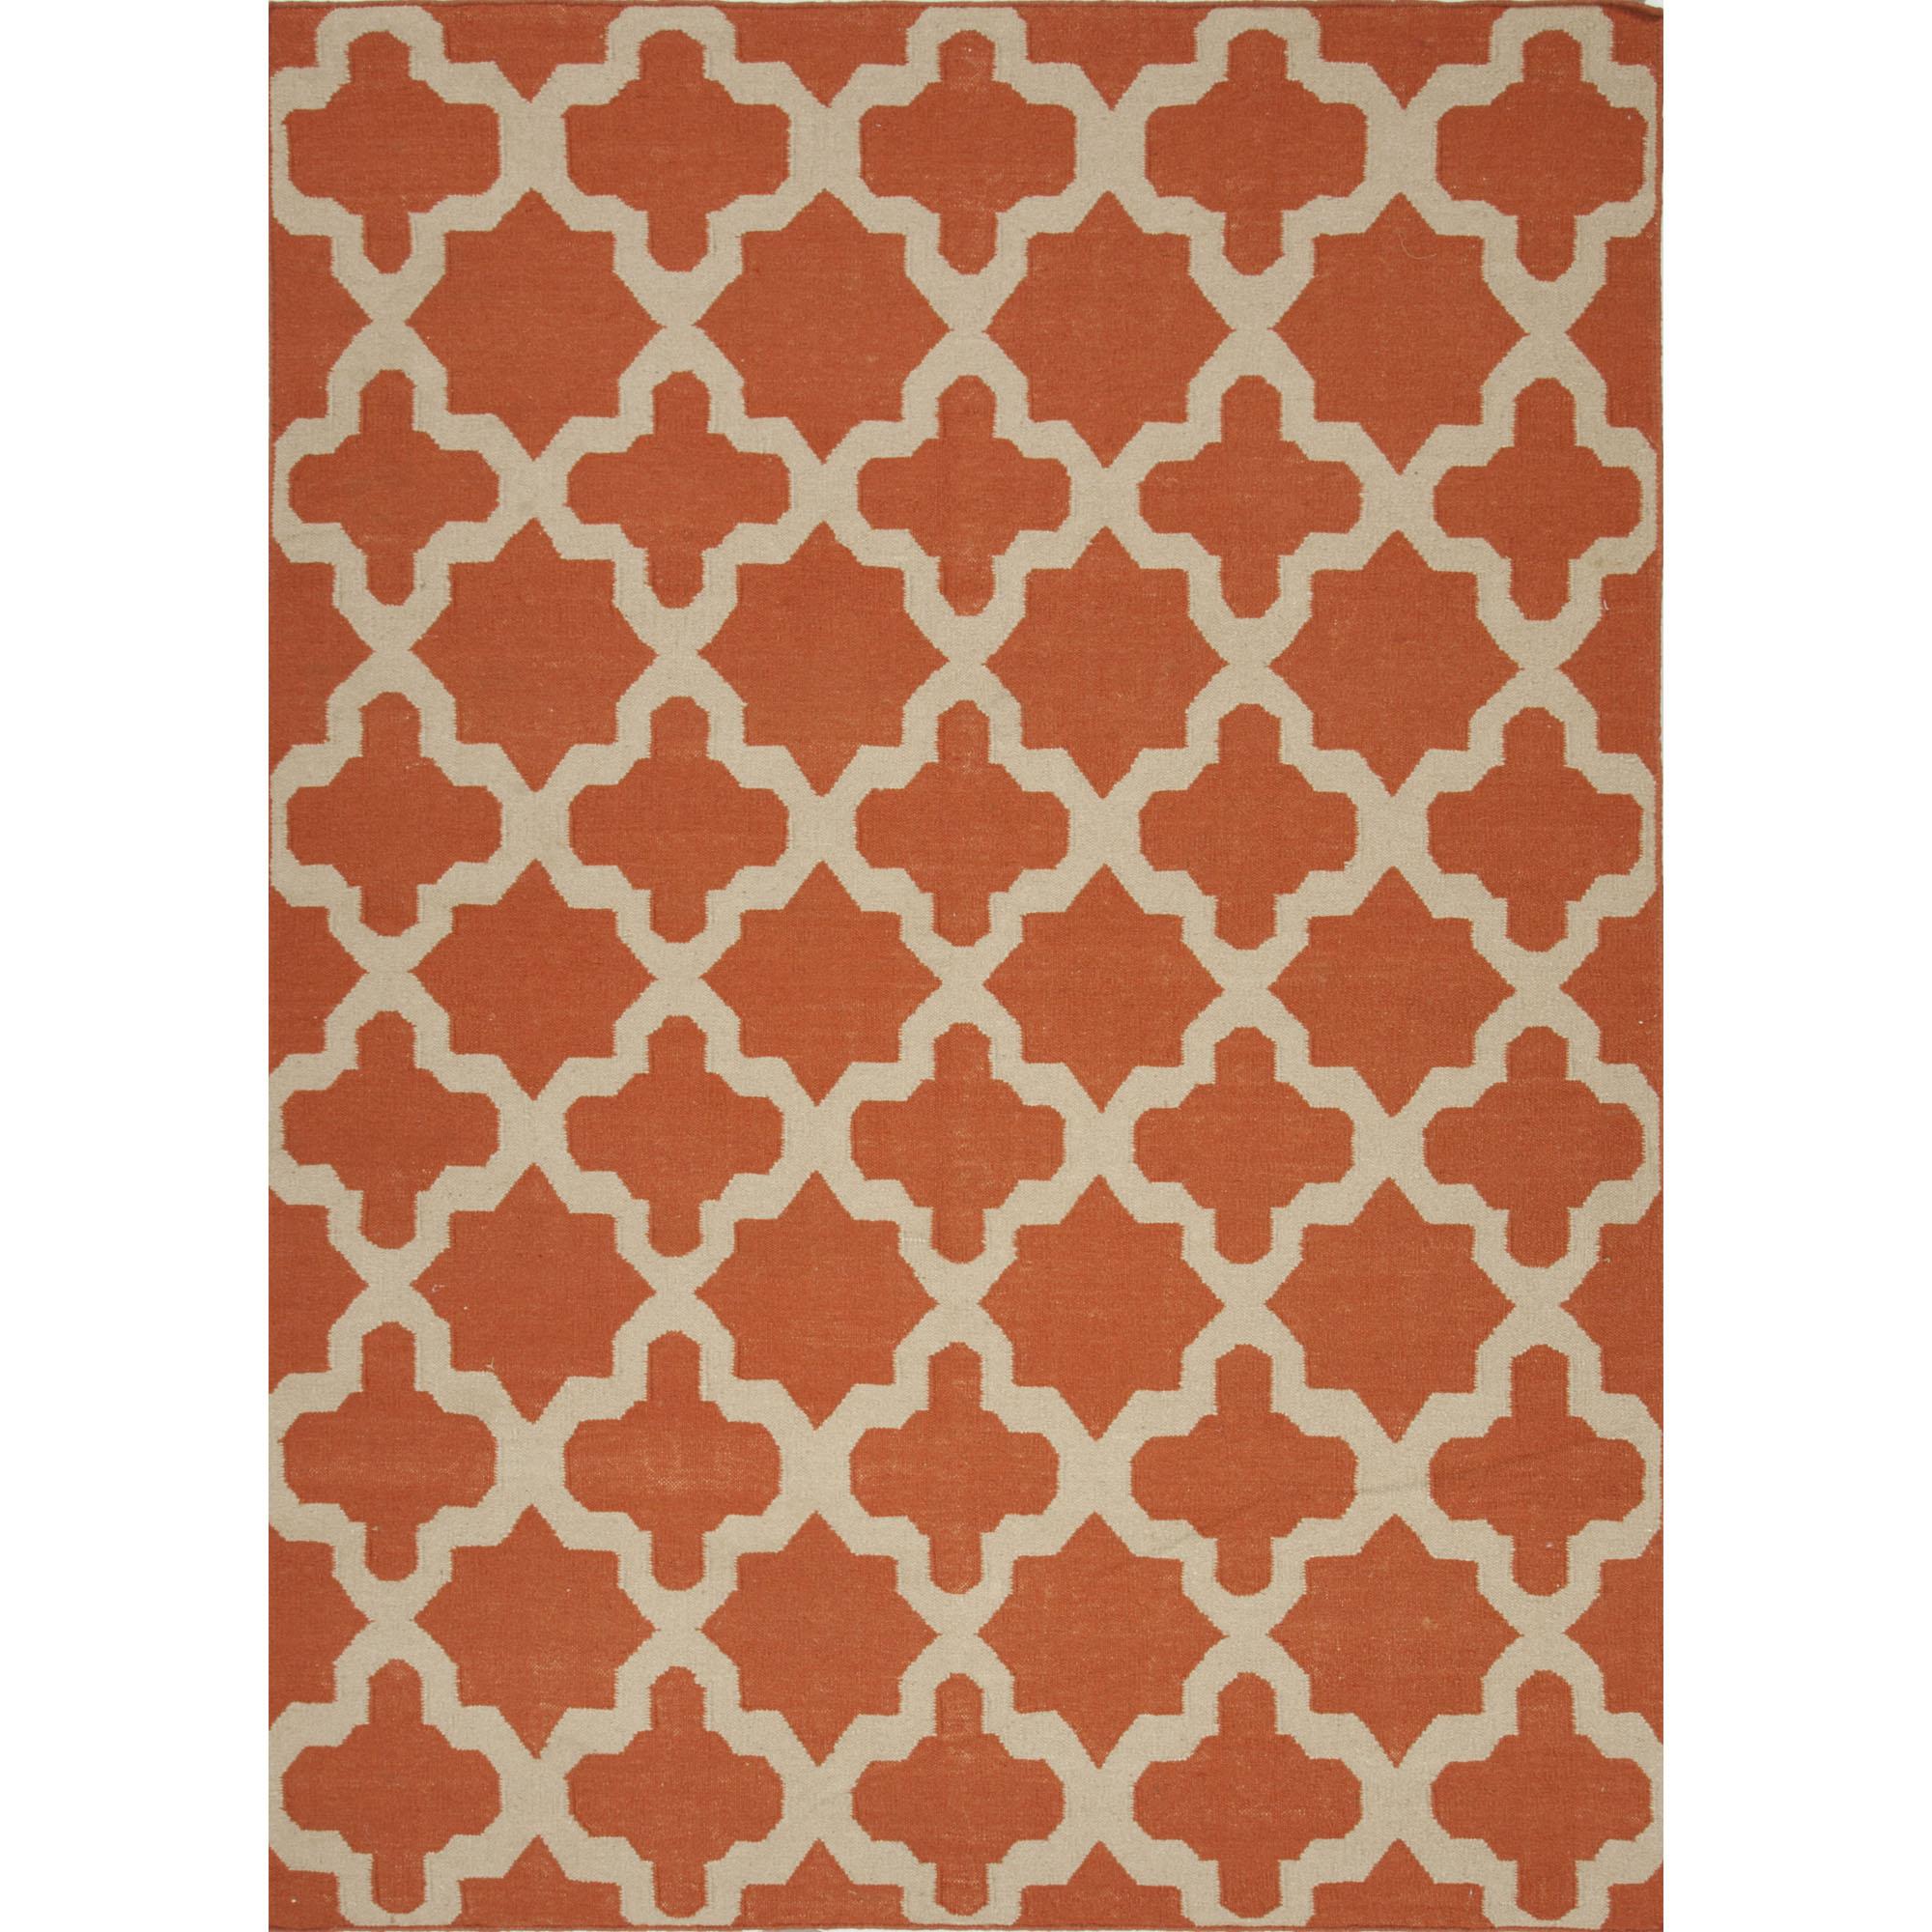 JAIPUR Rugs Maroc 5 x 8 Rug - Item Number: RUG102806